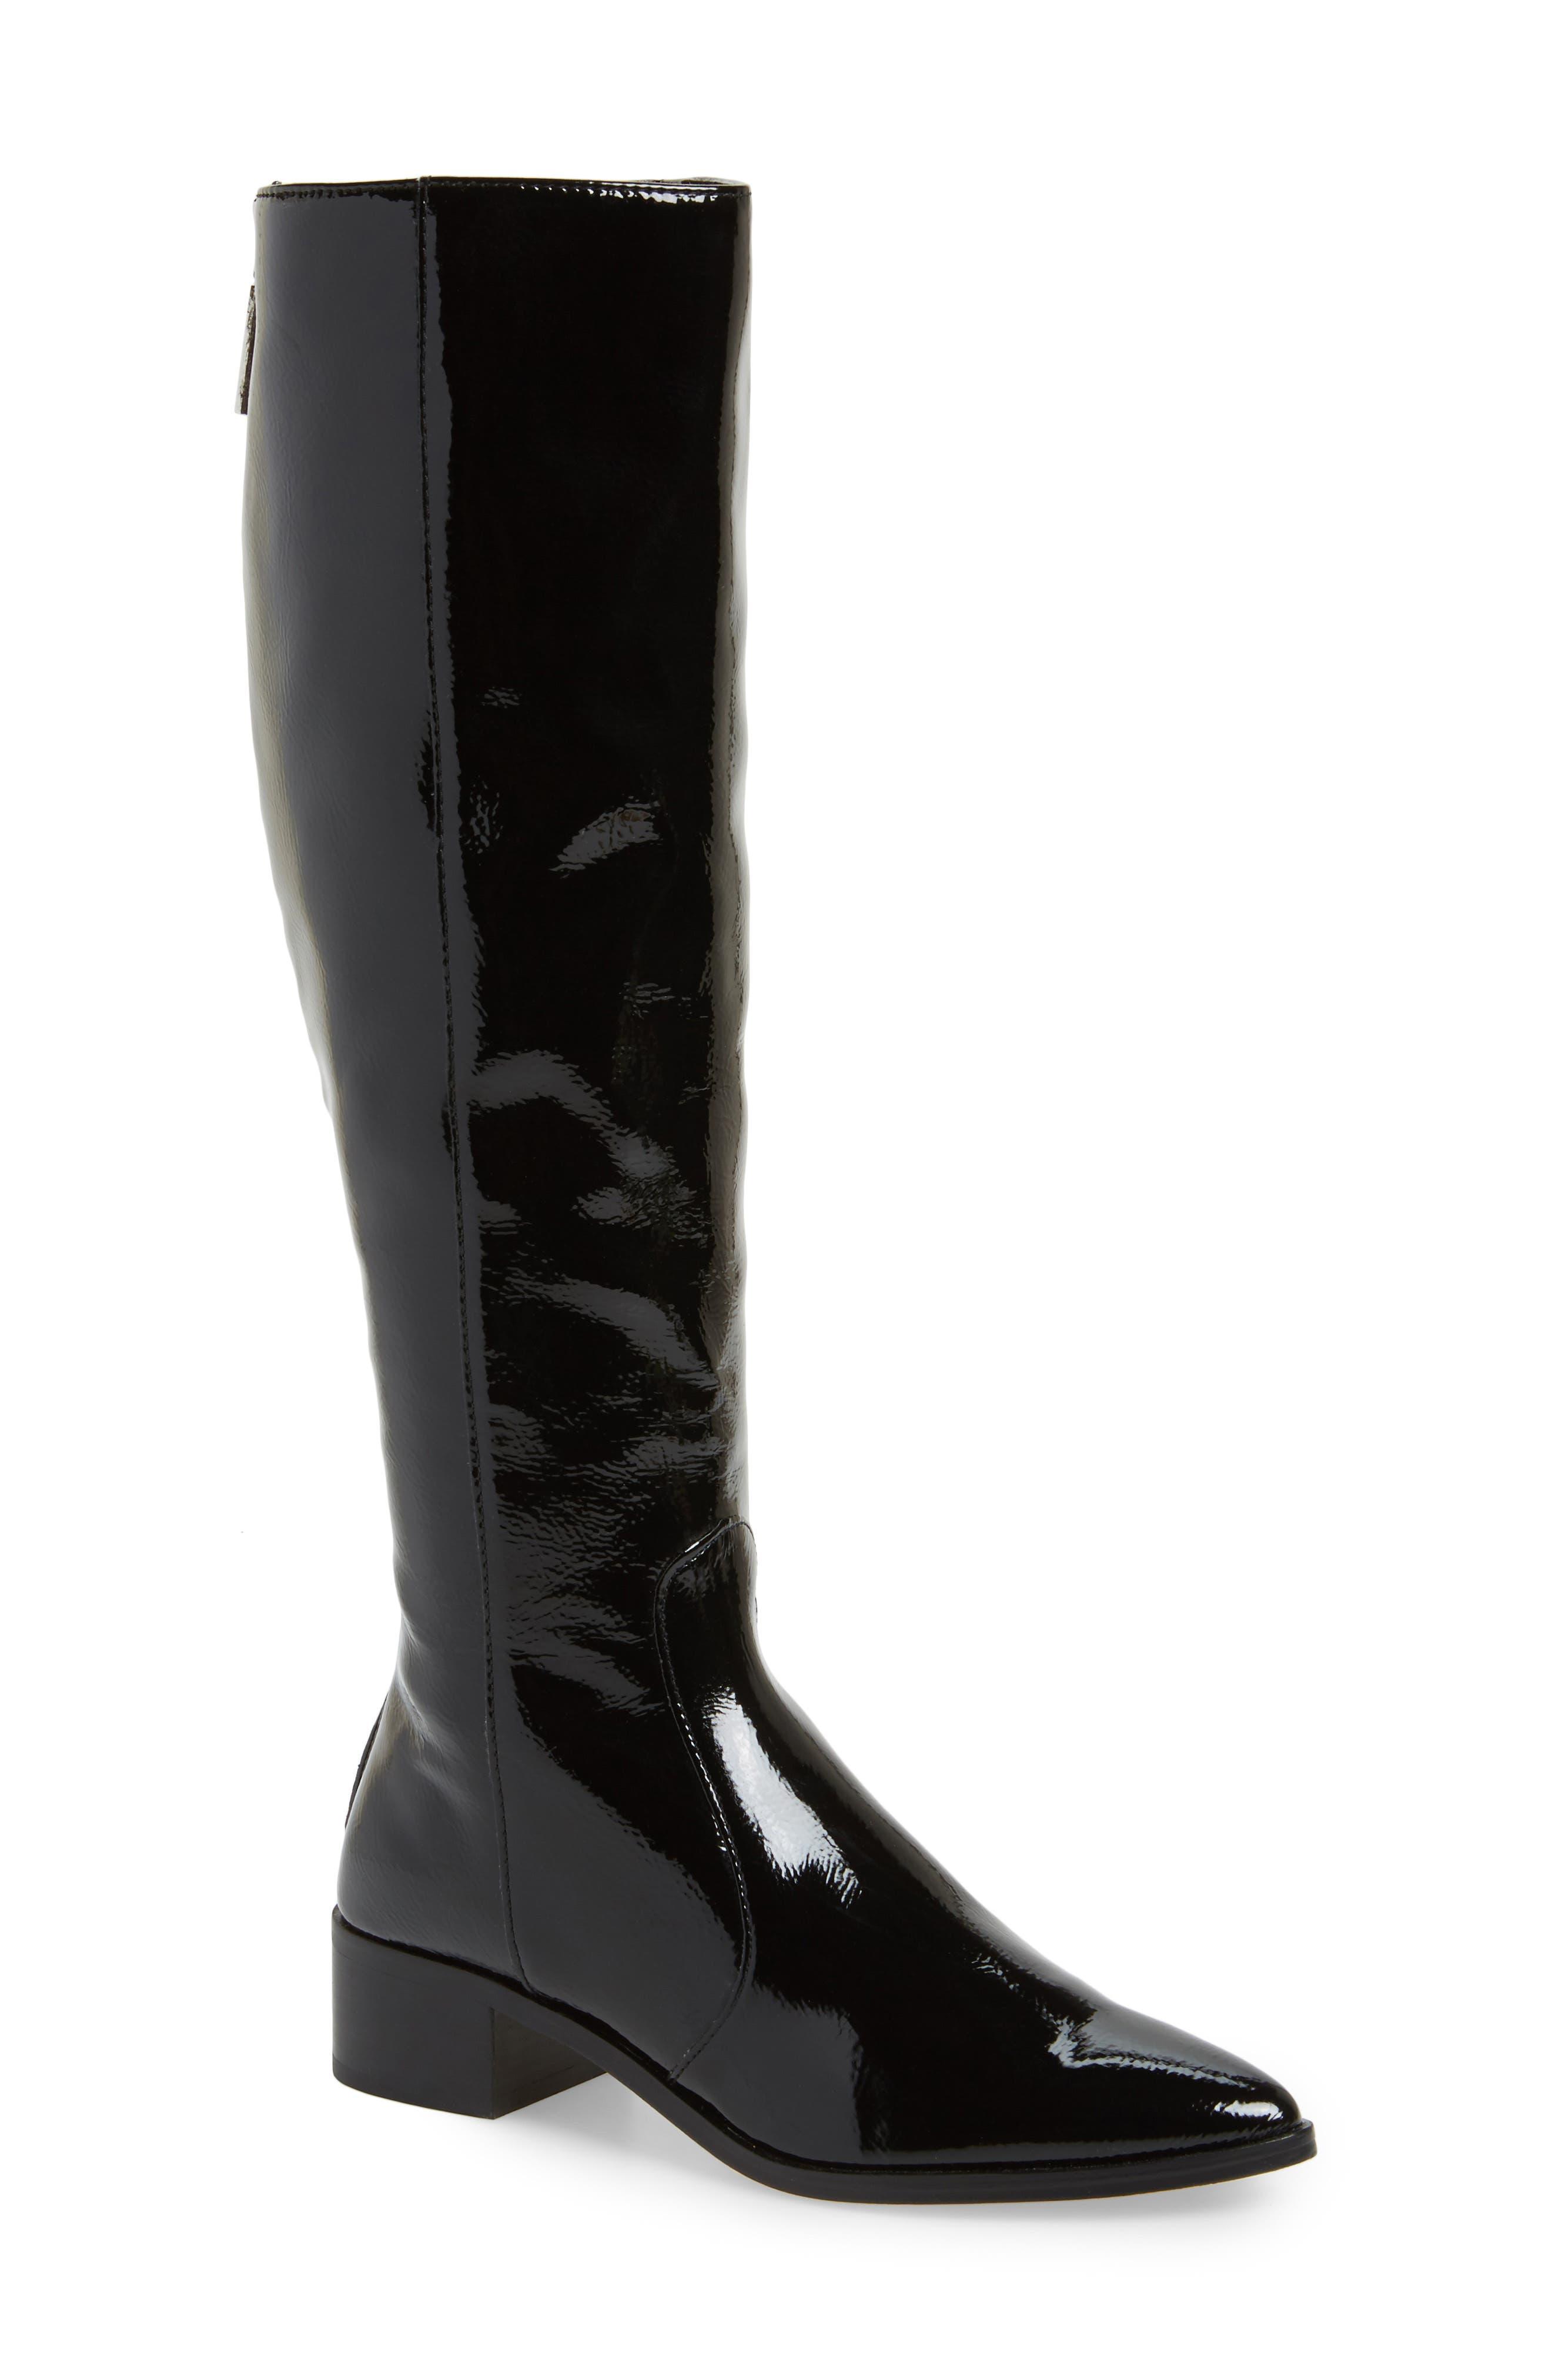 Alternate Image 1 Selected - Dolce Vita Morey Knee High Riding Boot (Women)